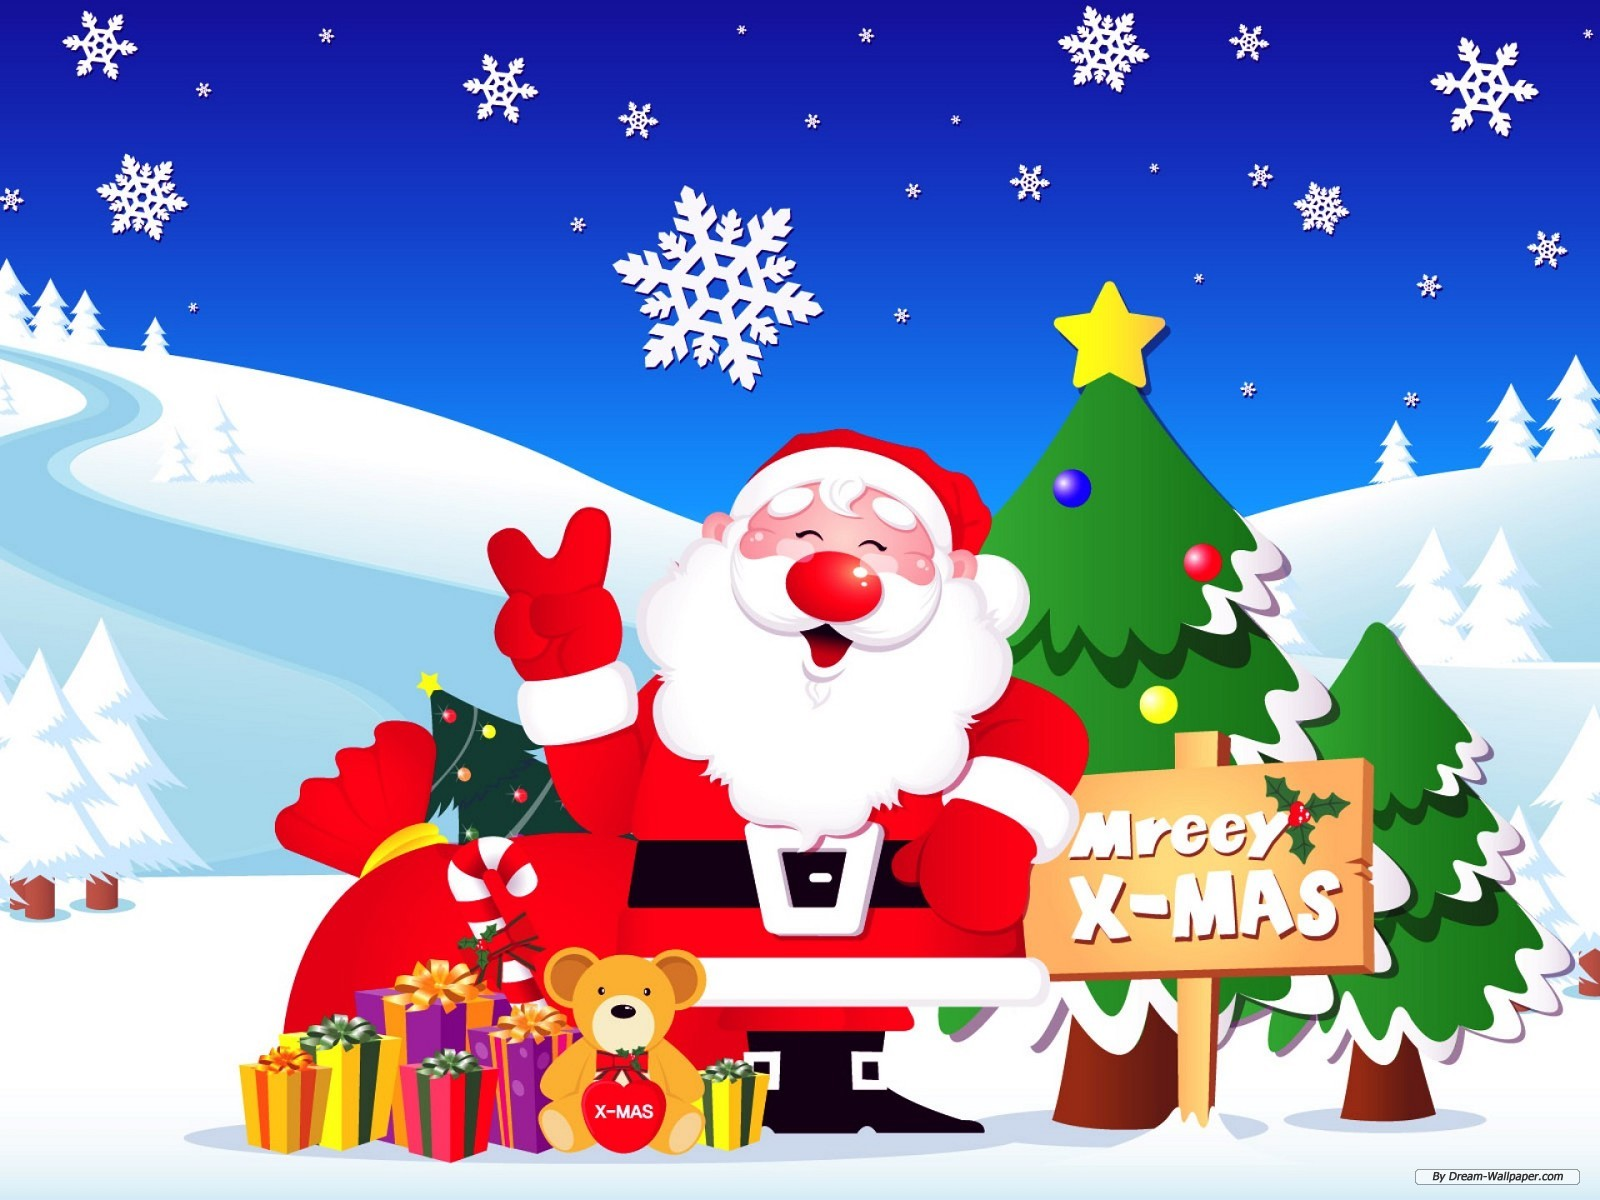 Christmas Desktop Free Theme Wallpaper - WallpaperSafari